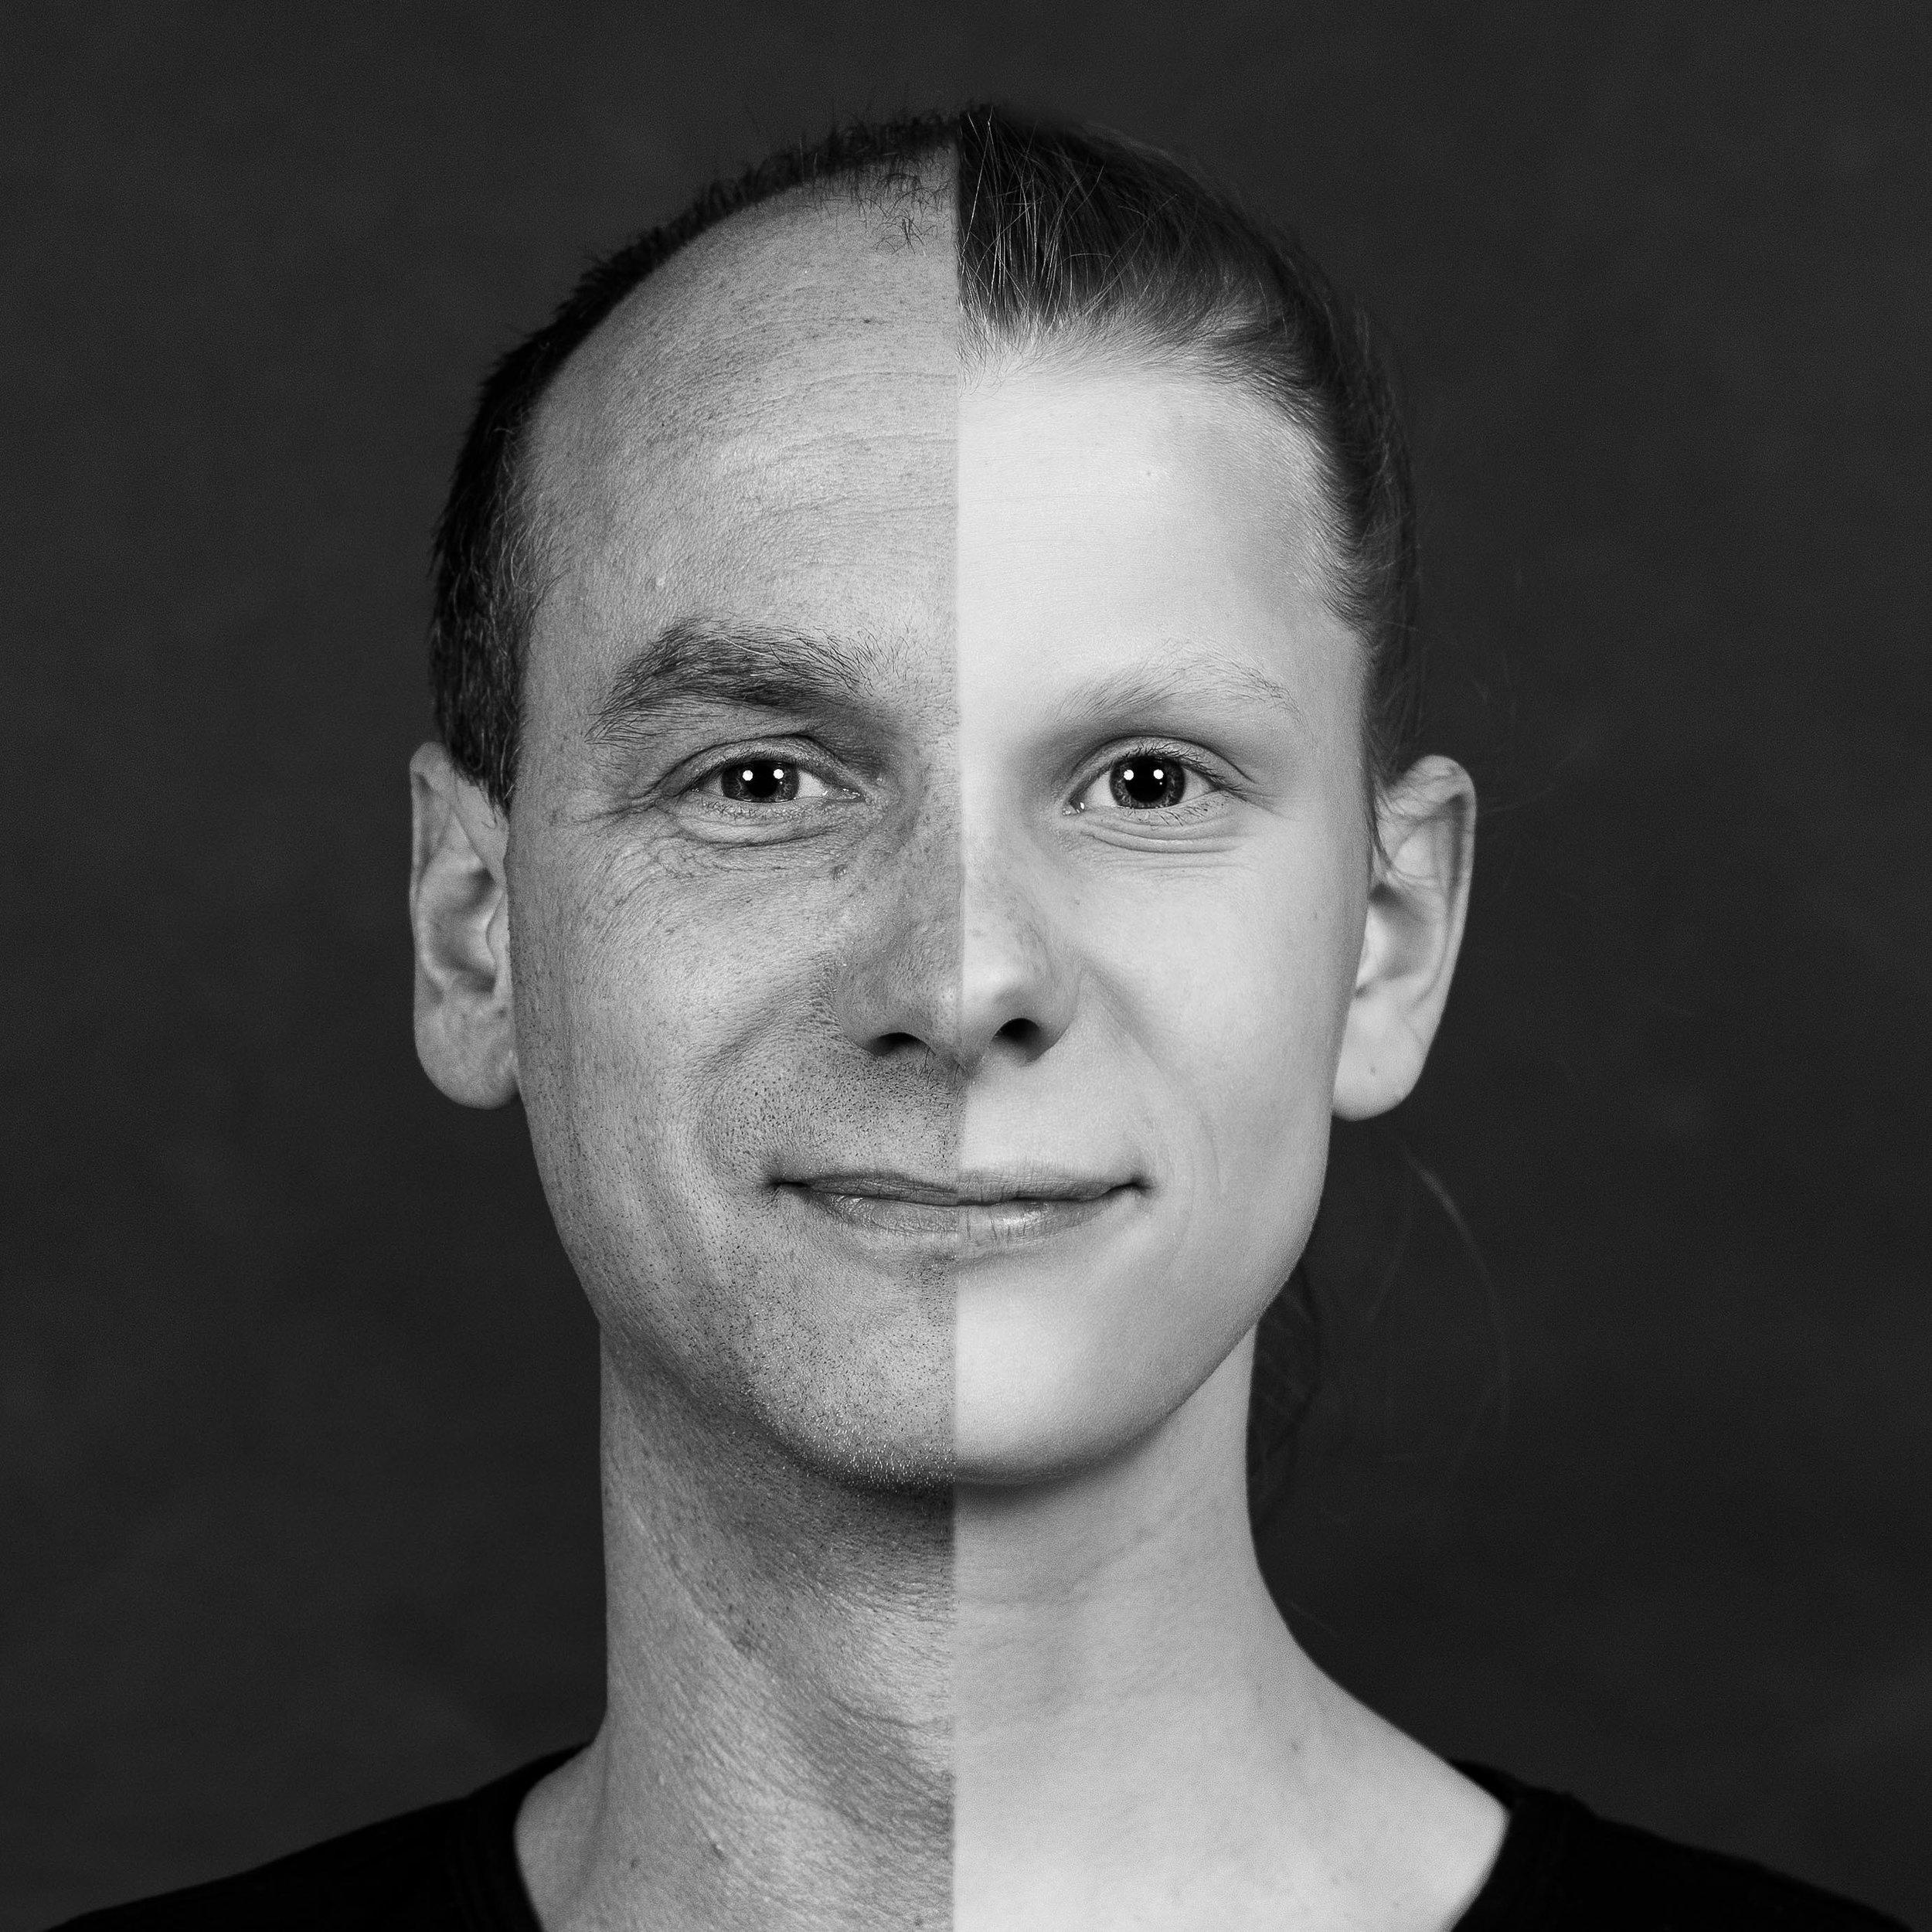 LvT Fotografie - project likeness of genes Amerongen